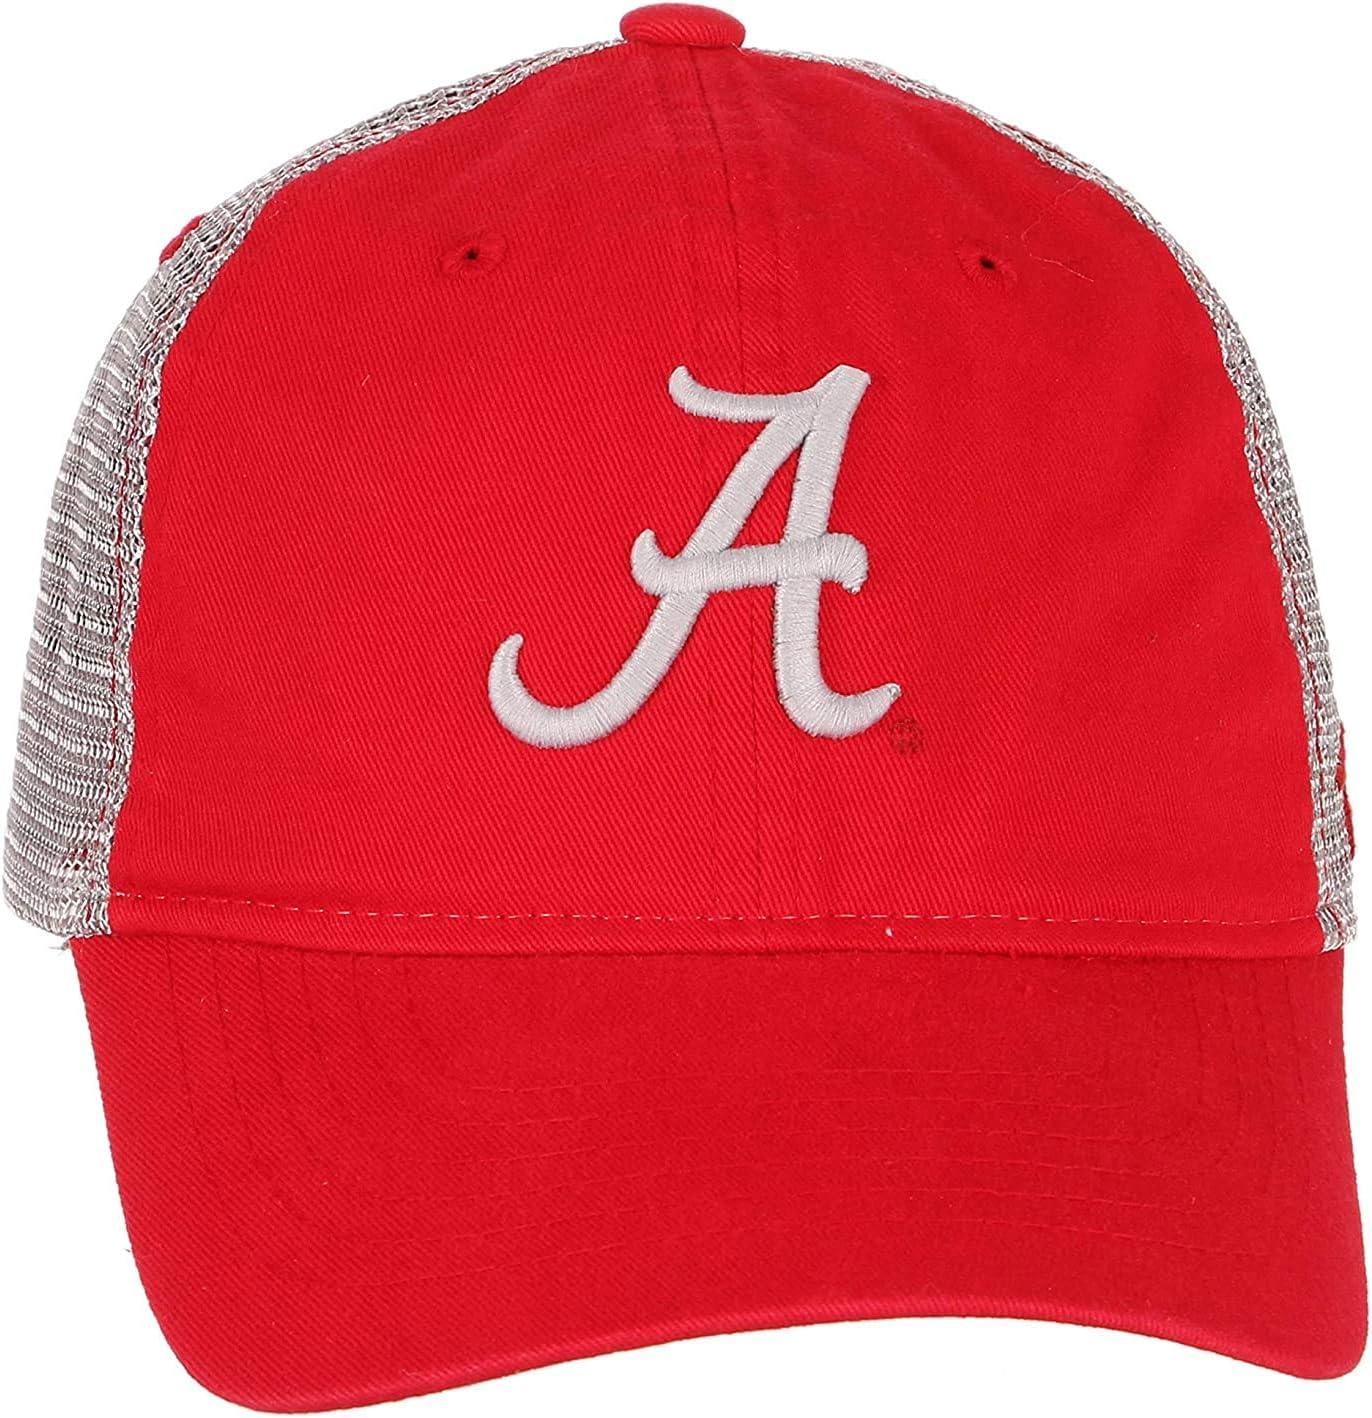 Campus Hats University of Alabama Crimson Tide Top Red Wash Cotton Nimbus Adult Mens//Womens//Youth Adjustable Baseball Mesh Trucker Hat//Cap